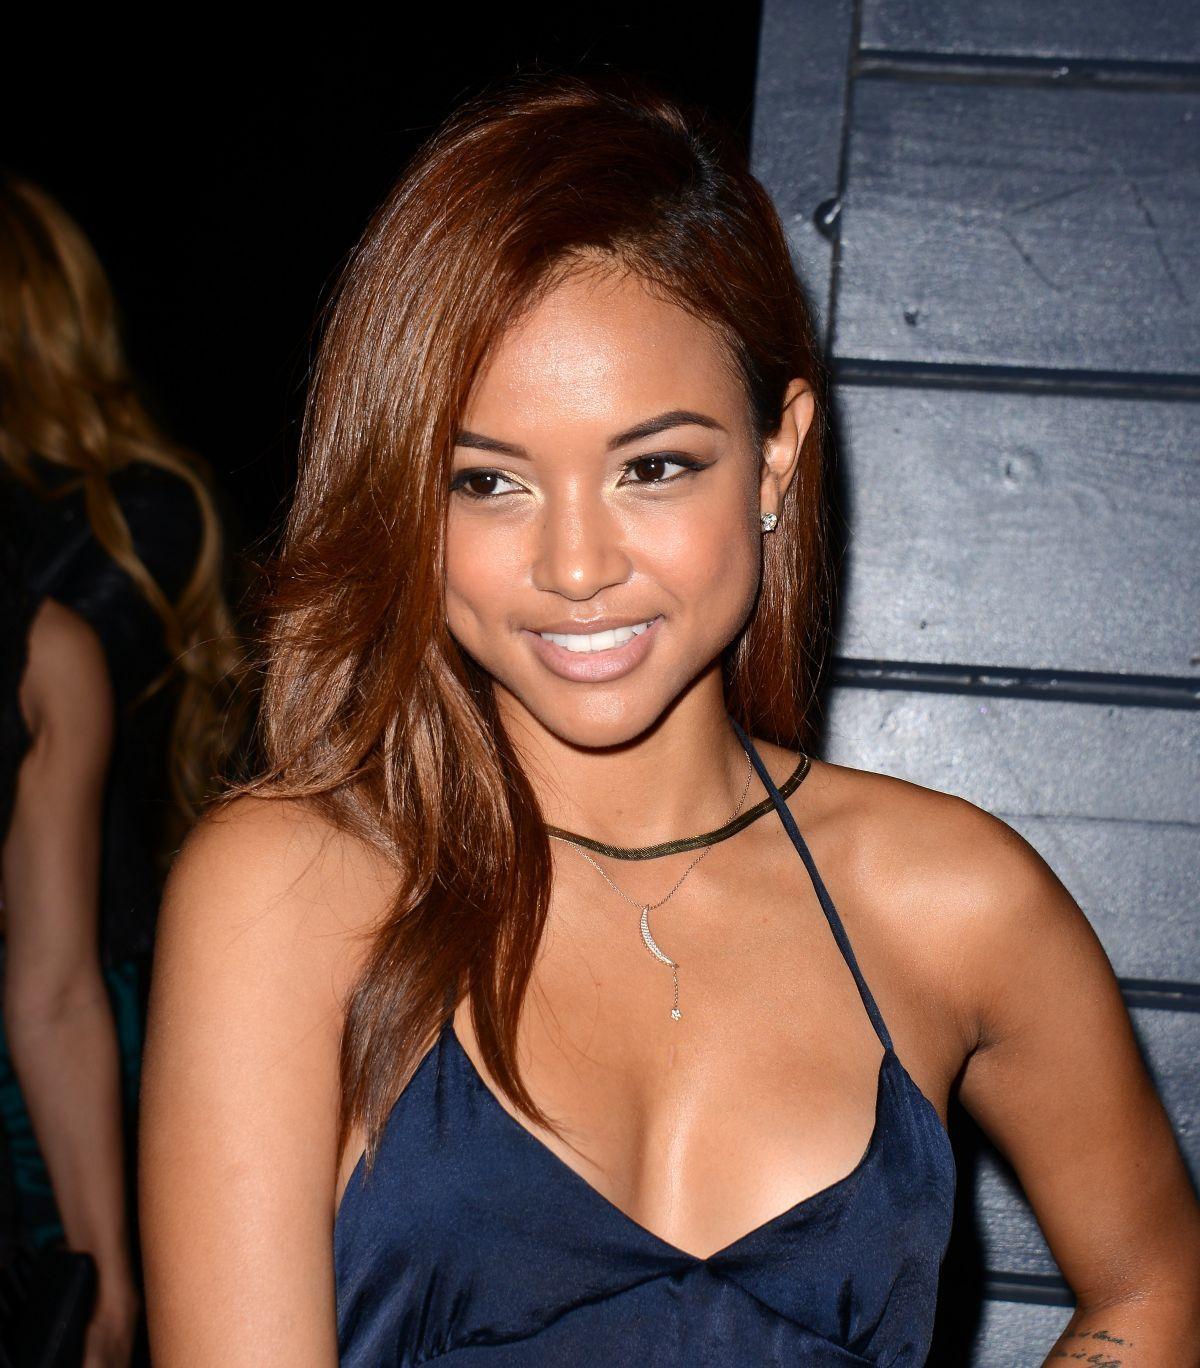 Nosee Rosee Video Karrueche Tran Publicly Mocks Blue Ivy S Hair Cool Hairstyles Pretty Hair Color Chris Brown Girlfriend